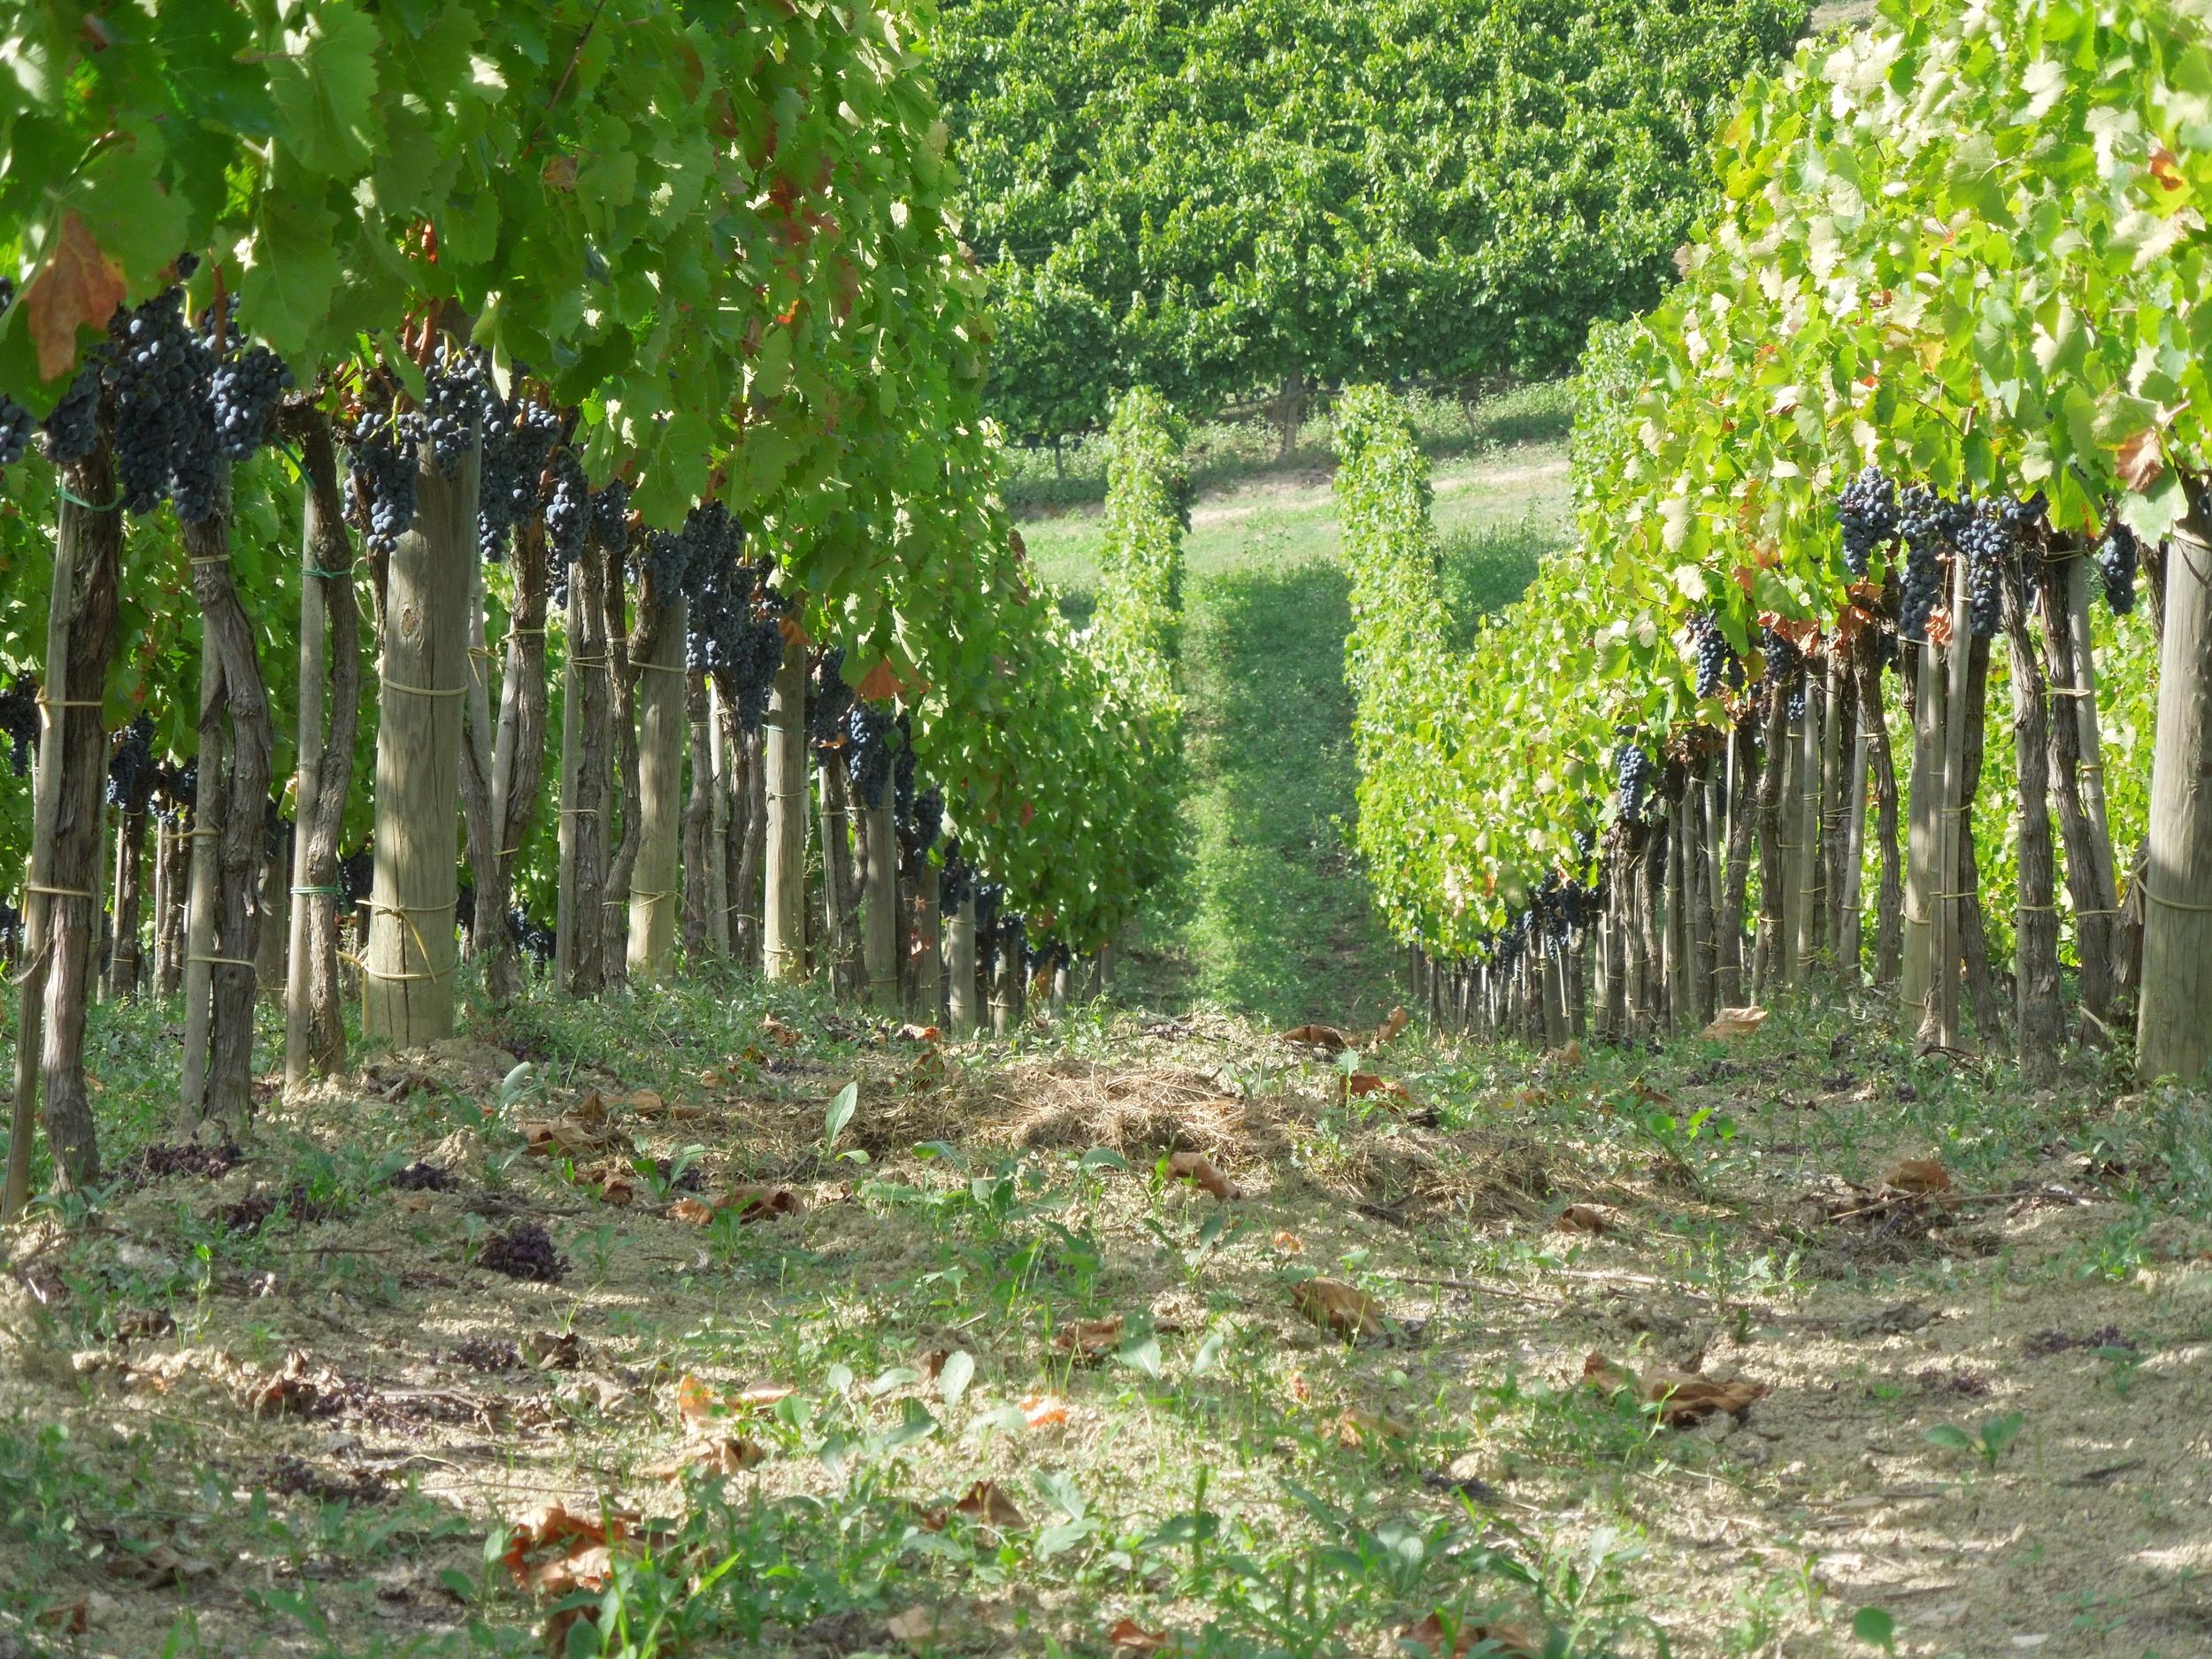 Quintodecimo vines